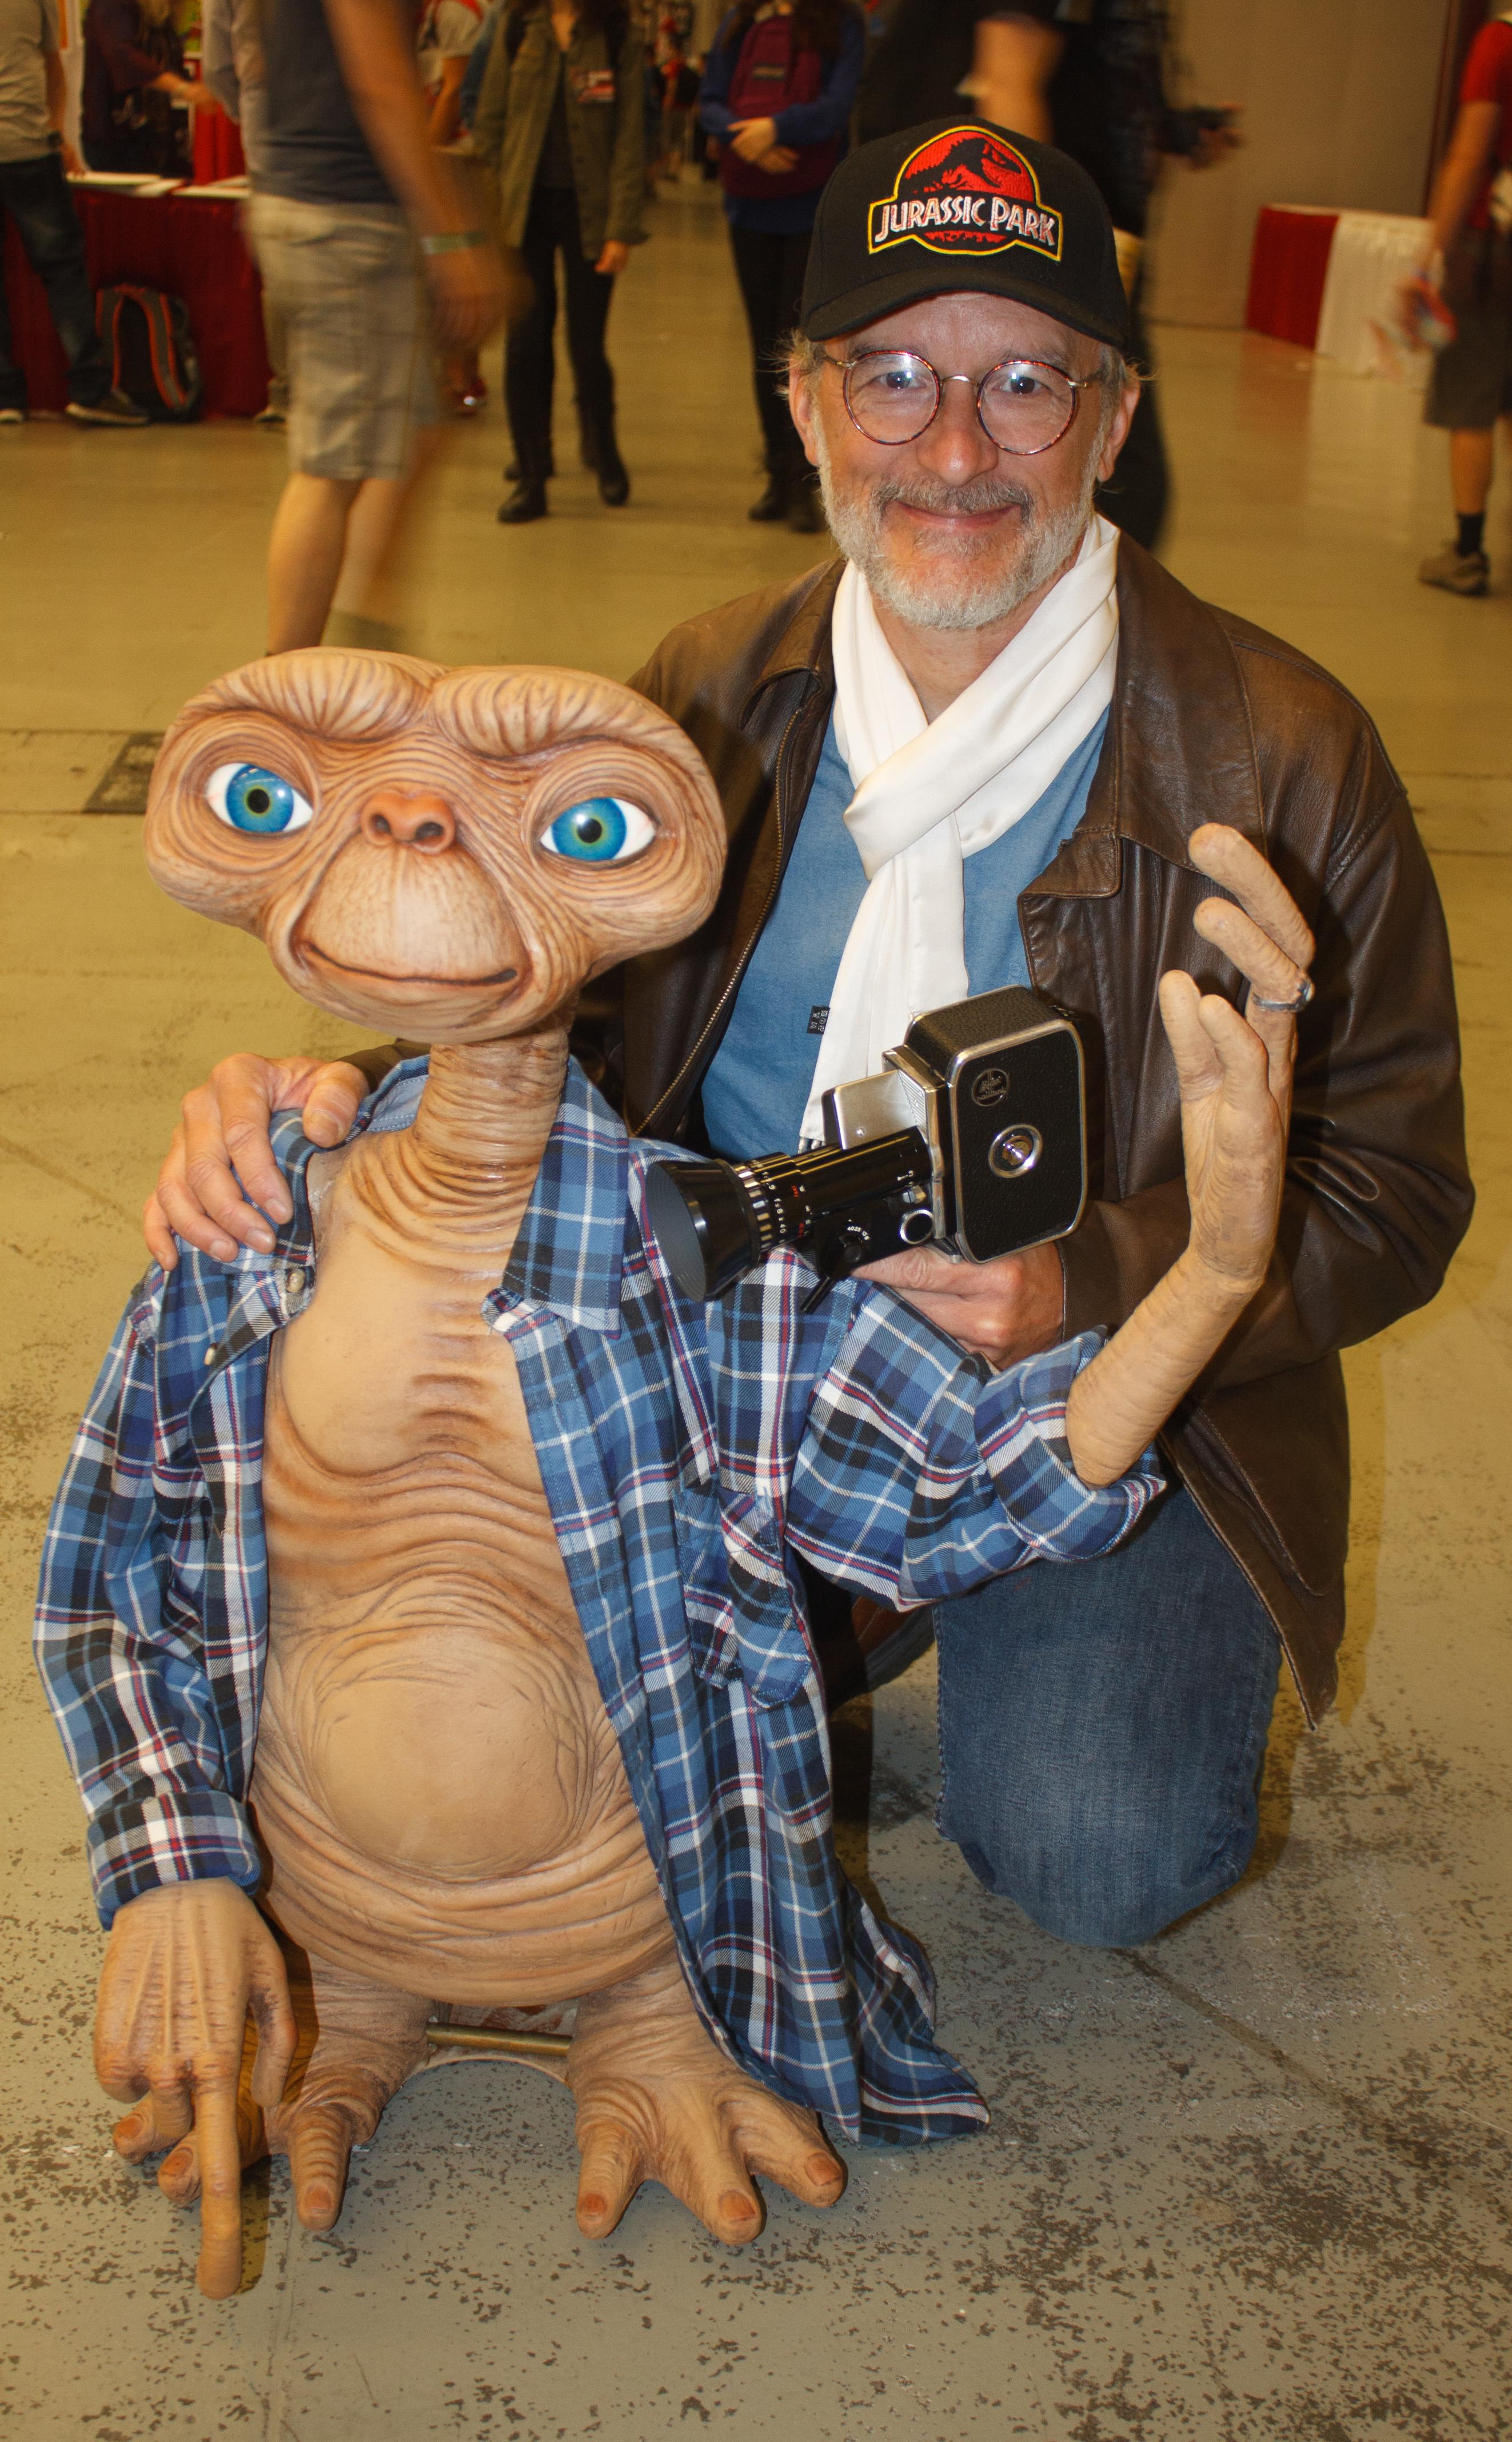 File:Montreal Comiccon 2016 - Steven Spielberg and ET ...